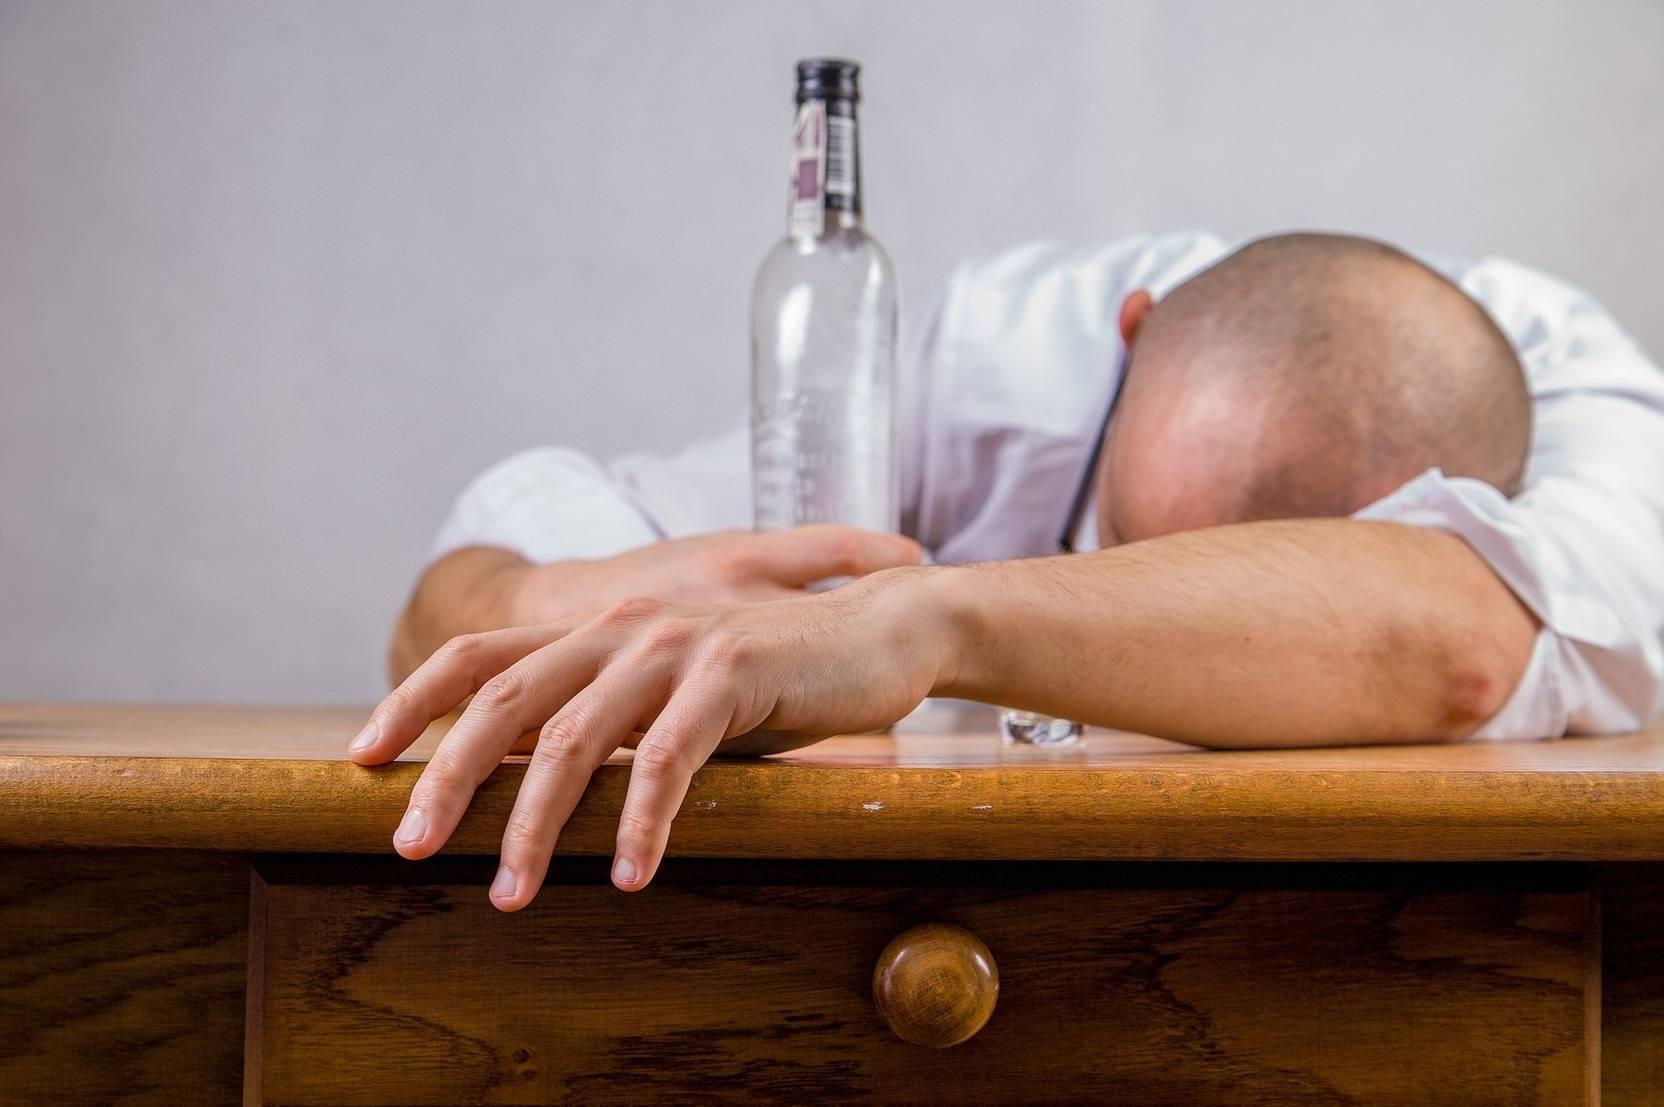 Признаки скорой смерти у алкоголика